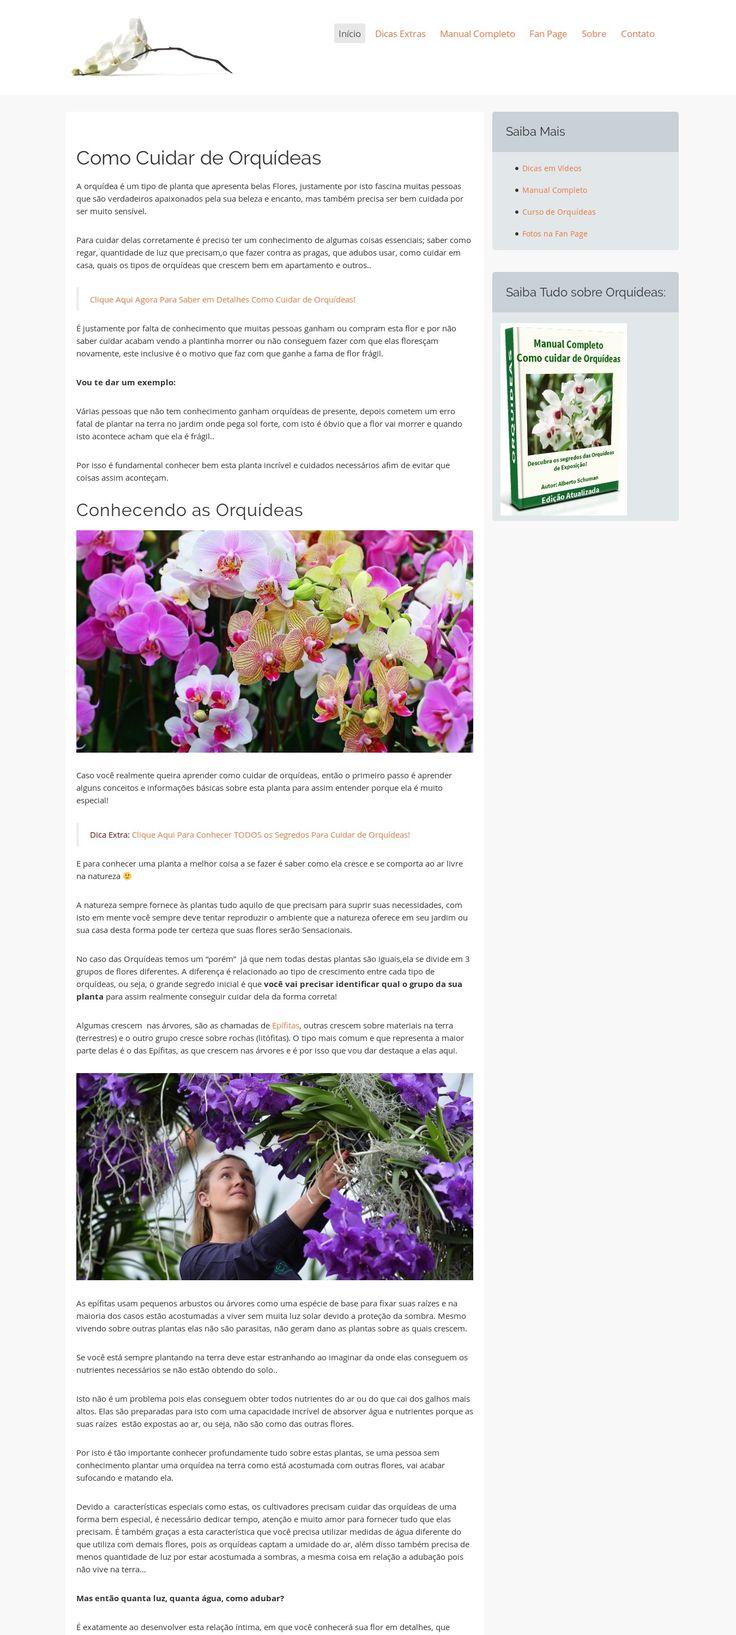 WordPress site floraeplantas.com uses the ConversionWP Premium wordpress theme